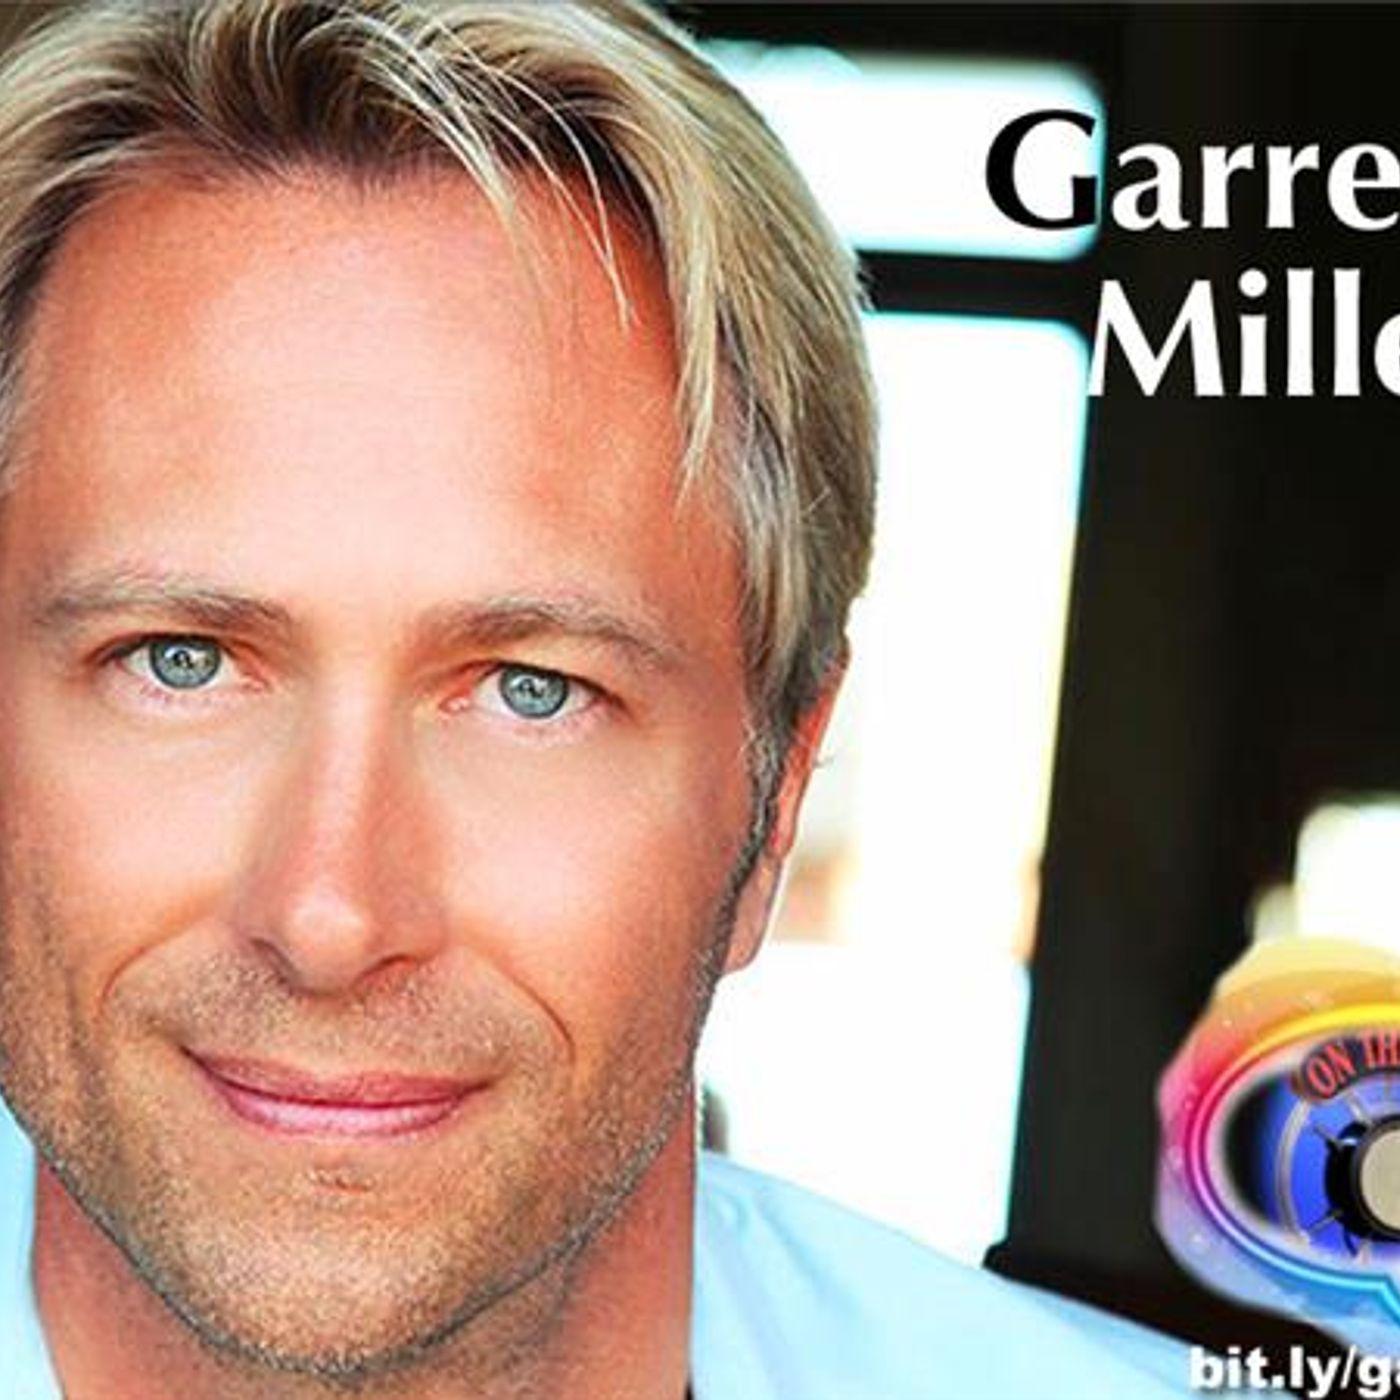 Gay Soul Talk - Meet A Blond Jesus - Garrett Miller ~ Singer ~ Author ~ Producer